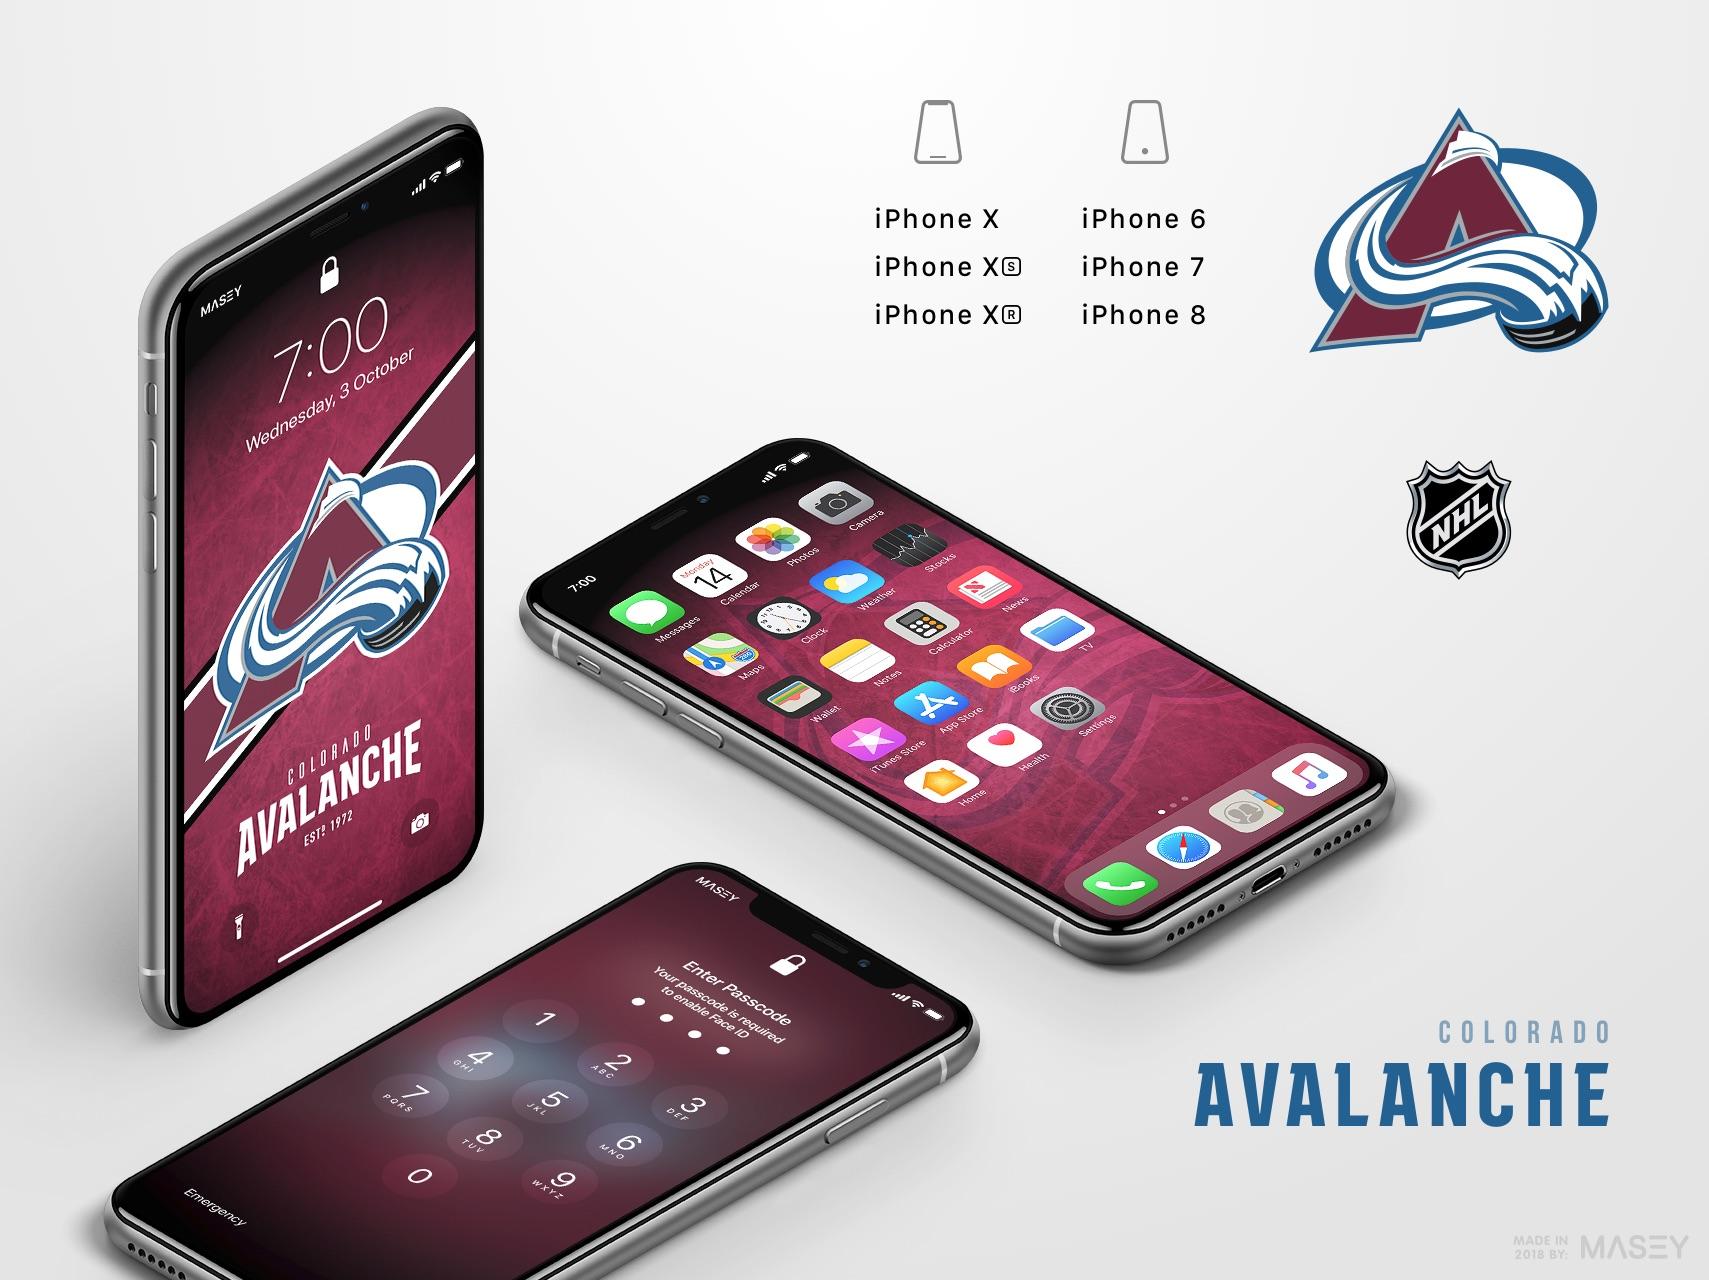 Colorado Avalanche iPhone Wallpaper